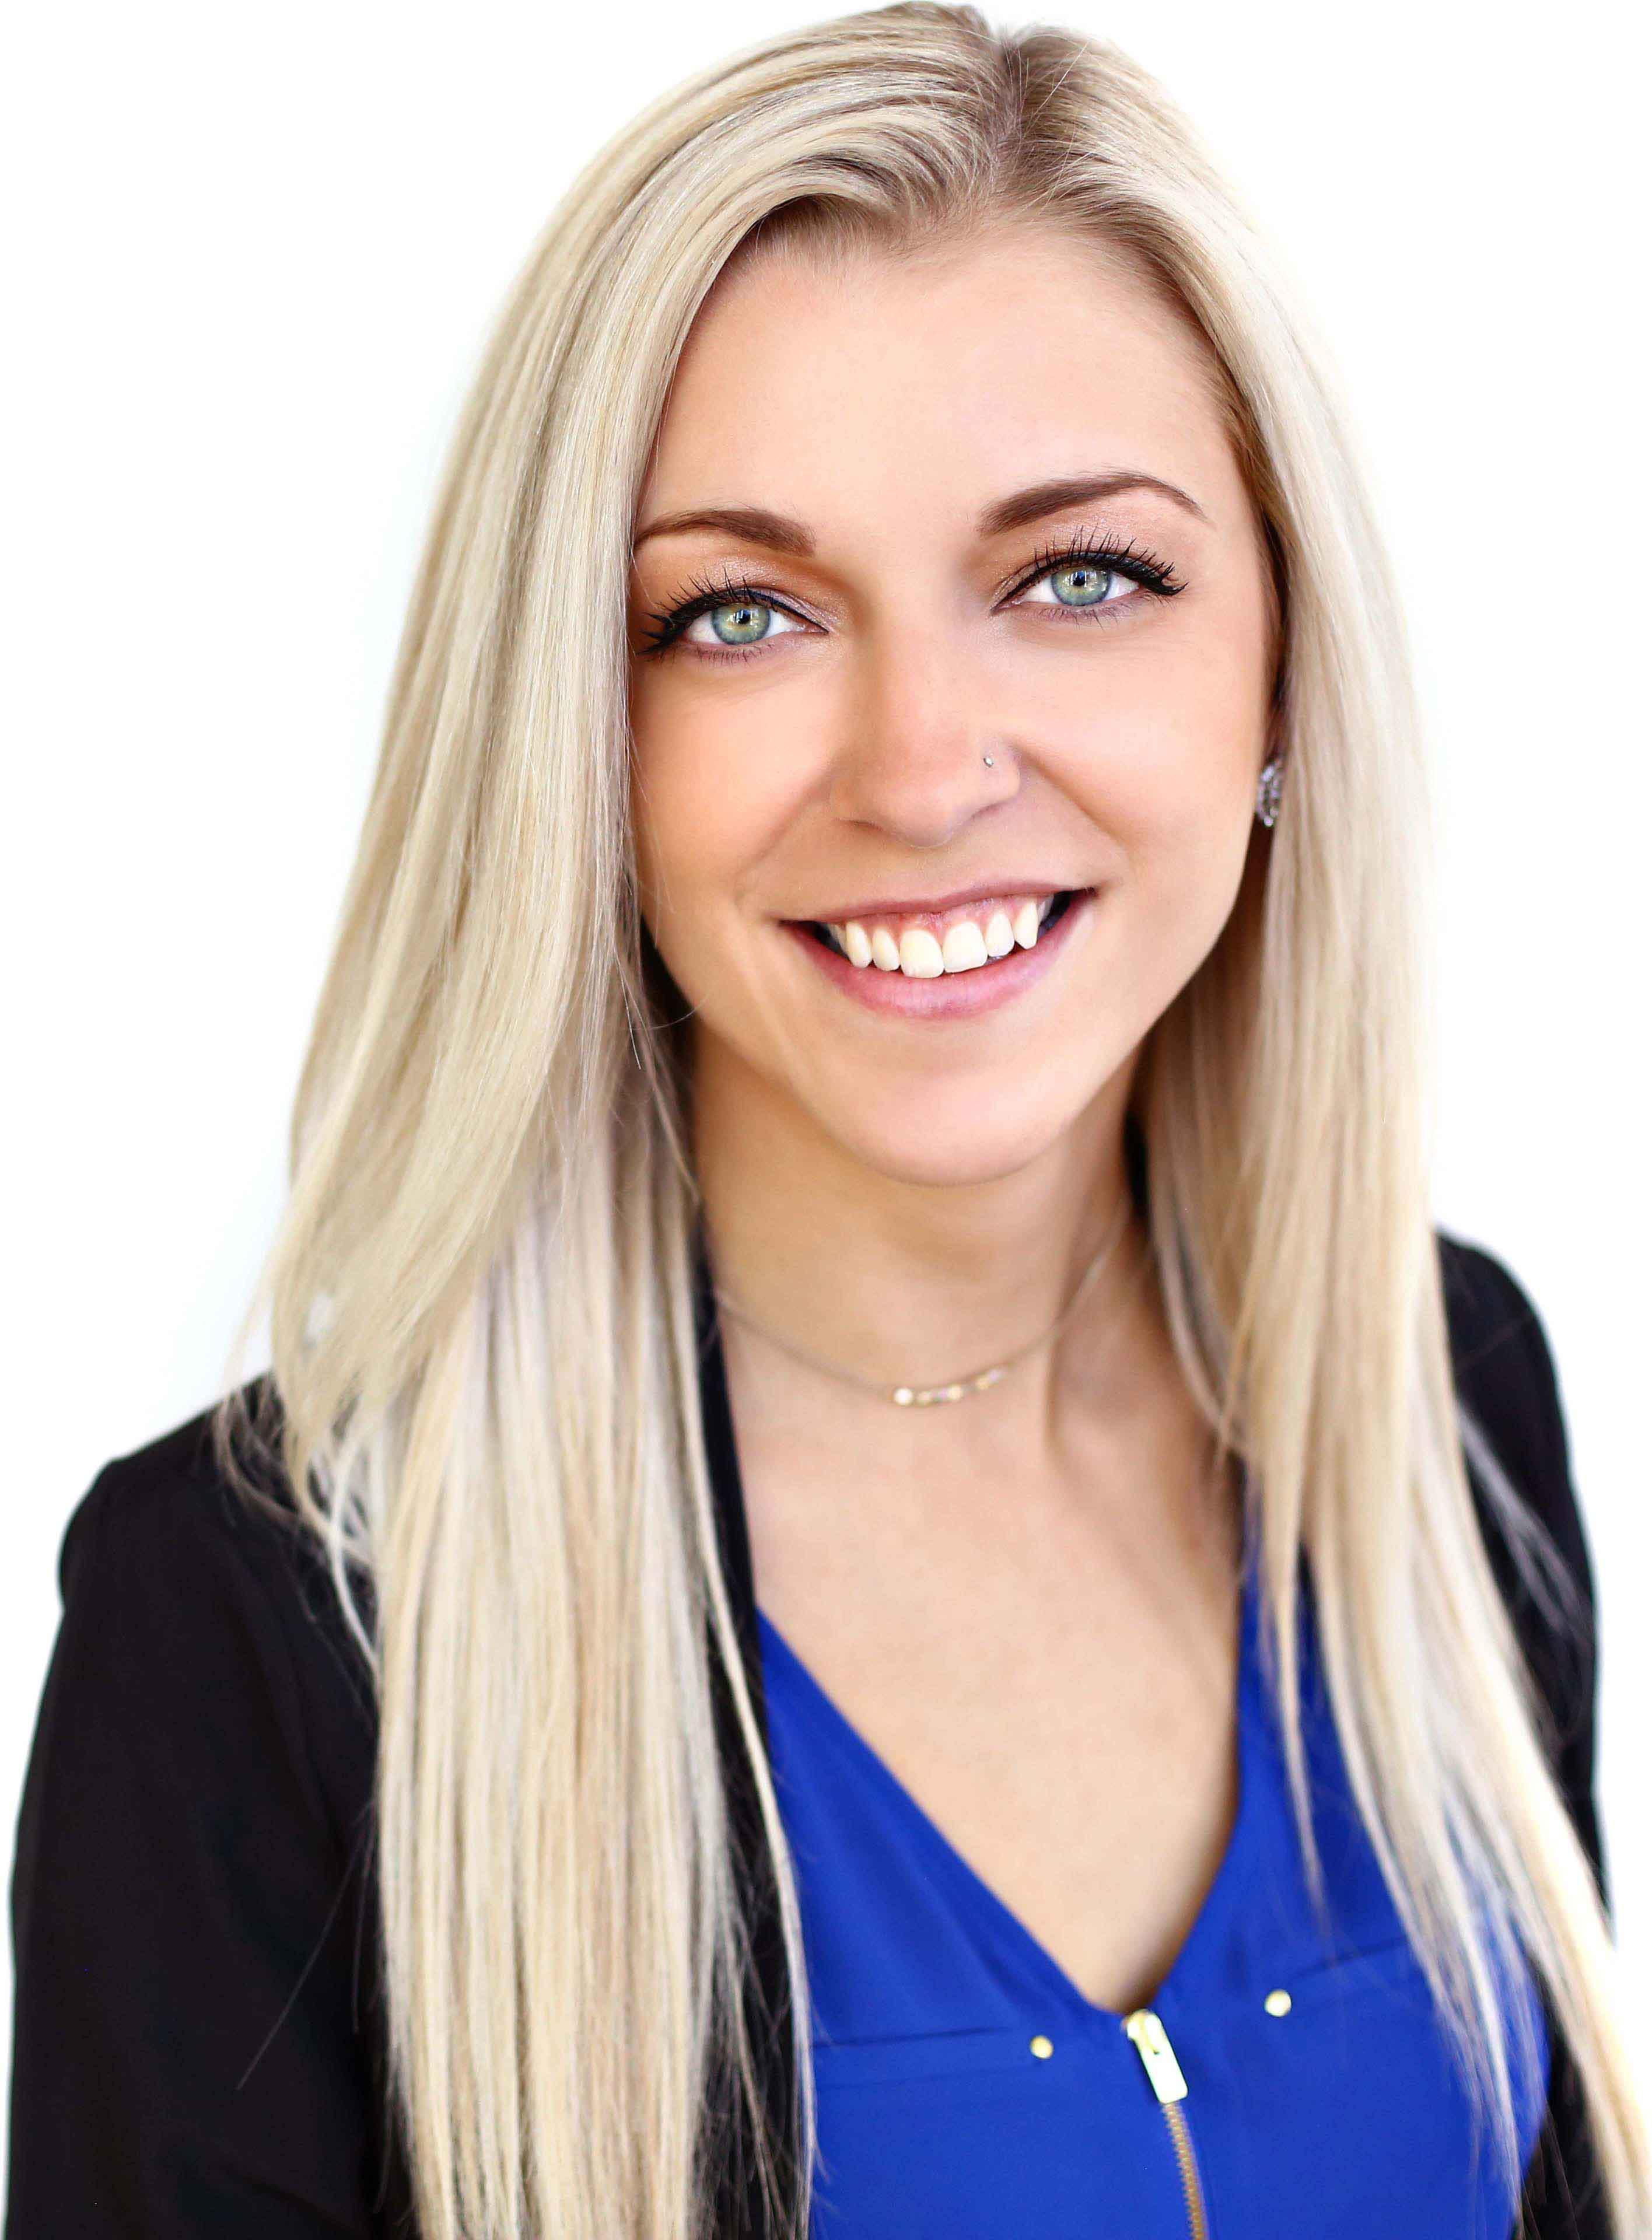 Alyx Pederson